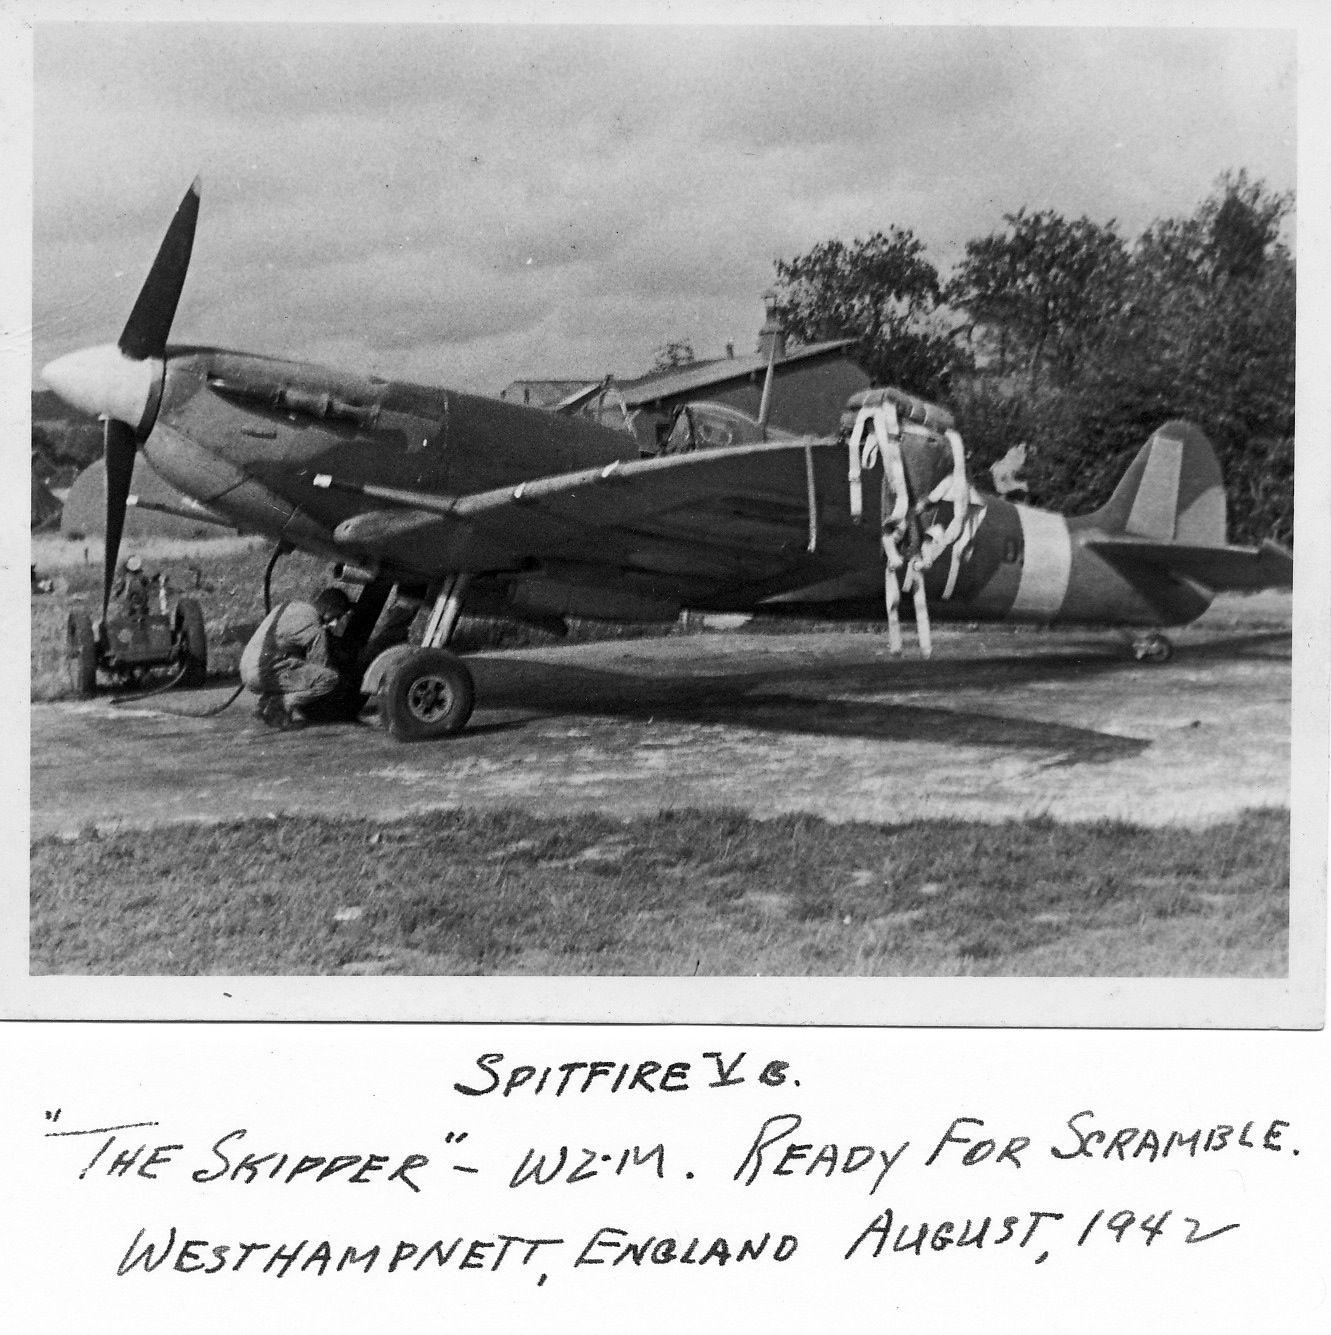 Spitfire MkVb RAF 309Sqn WZM Westhampnett England Aug 1942 01